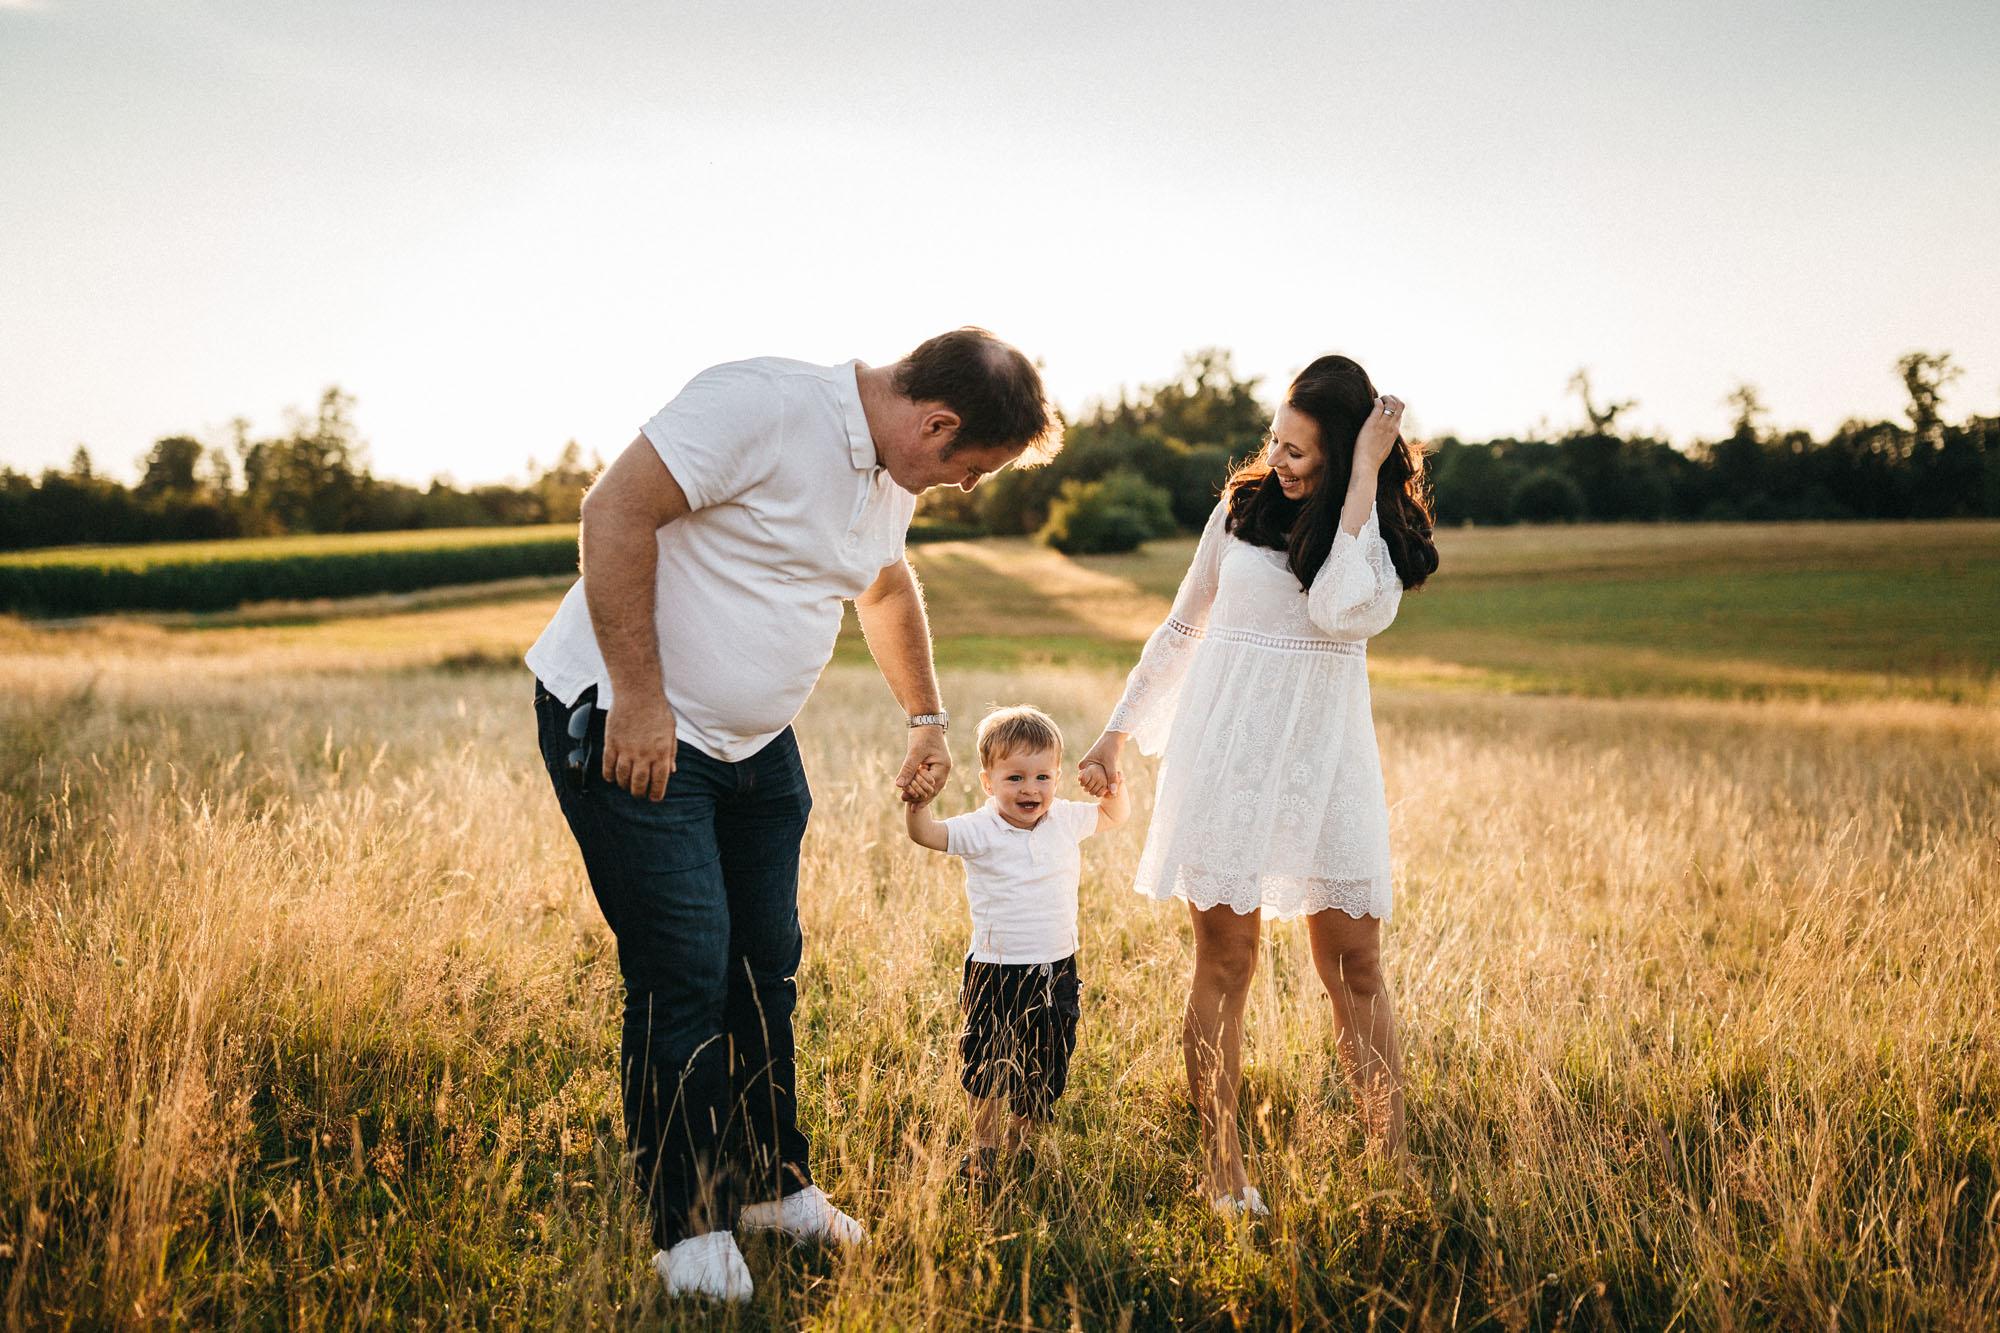 Familie hat Spaß bei Familienshooting in Augsburg - Raissa + SImon Fotografie